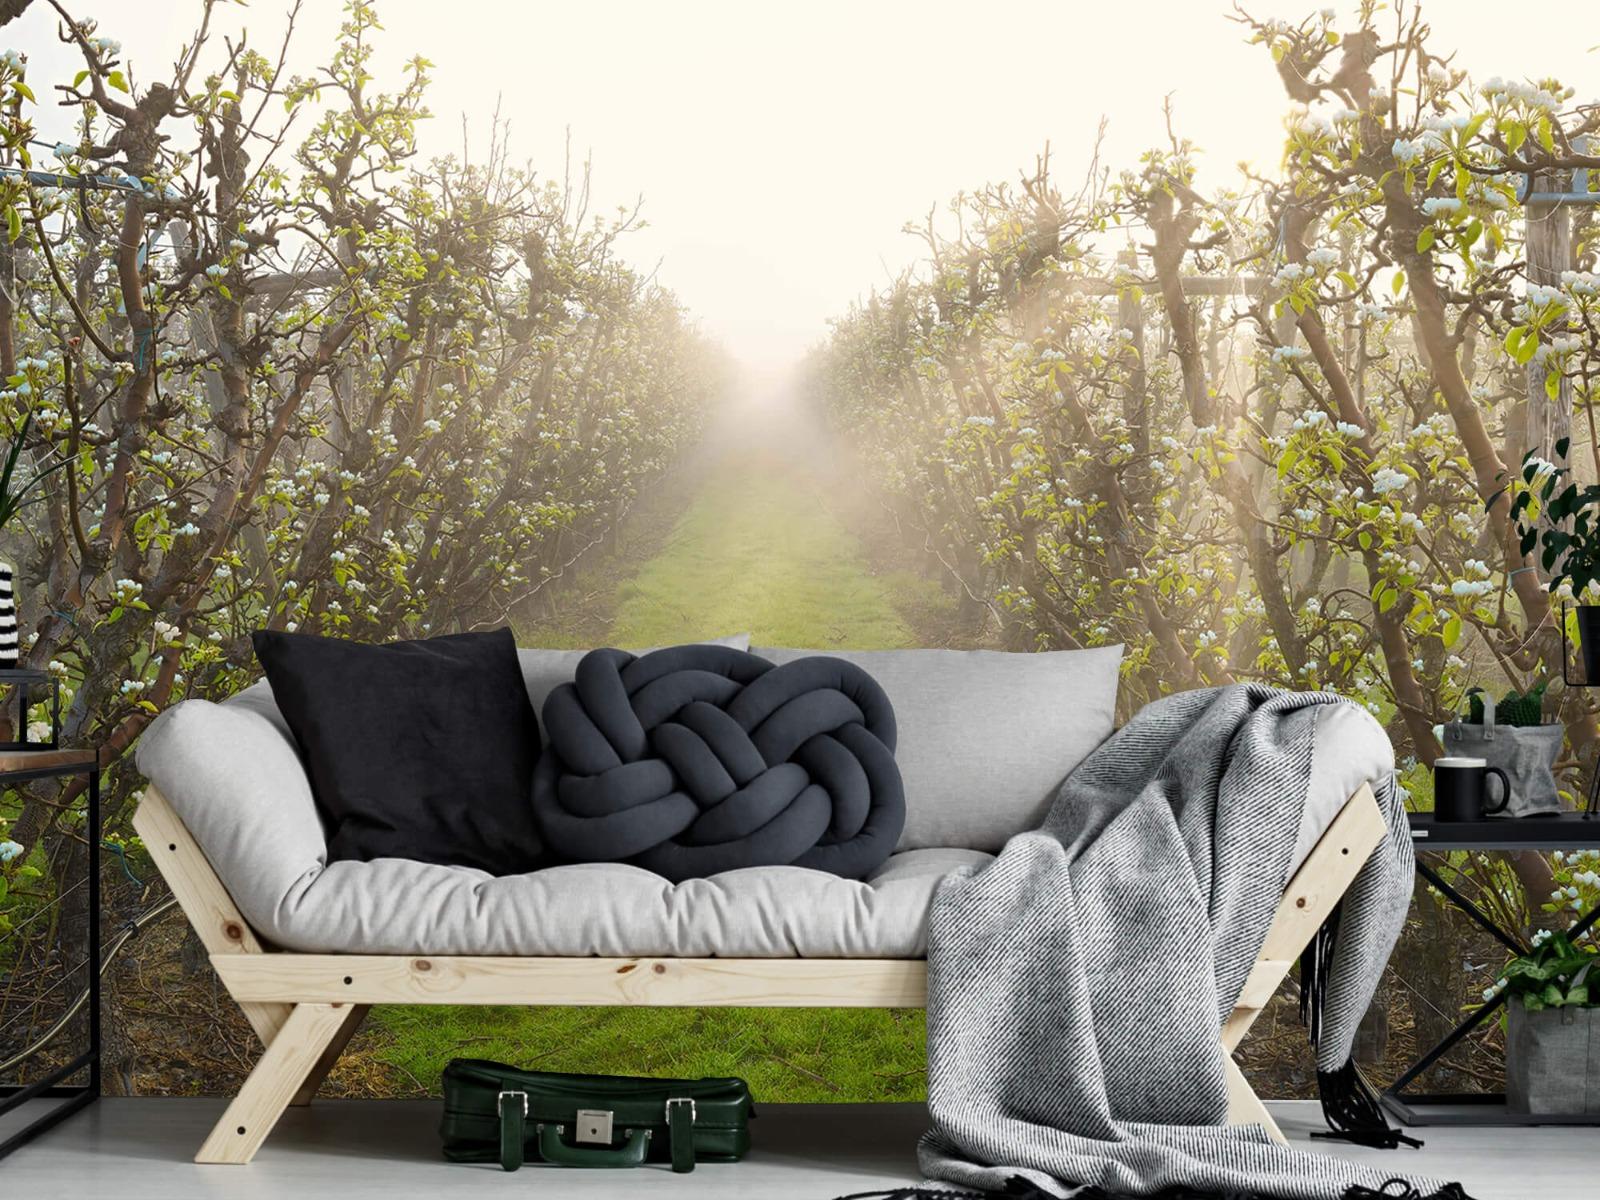 Bomen - Perenbloesem in mist - Slaapkamer 7